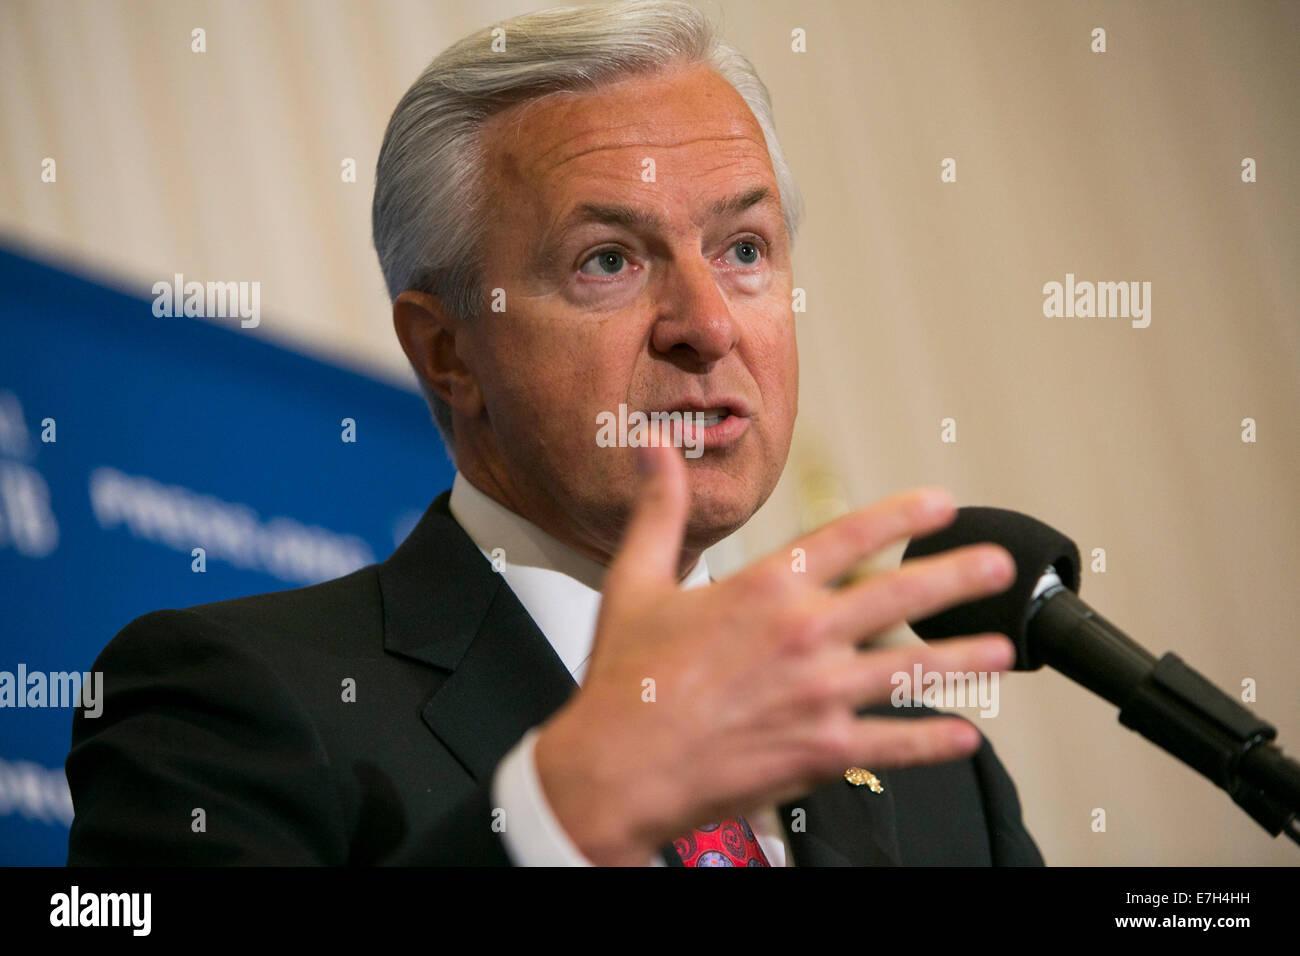 Washington DC, USA. 17th Sep, 2014. Wells Fargo & Company Chairman, President and CEO John Stumpf delivers remarks Stock Photo